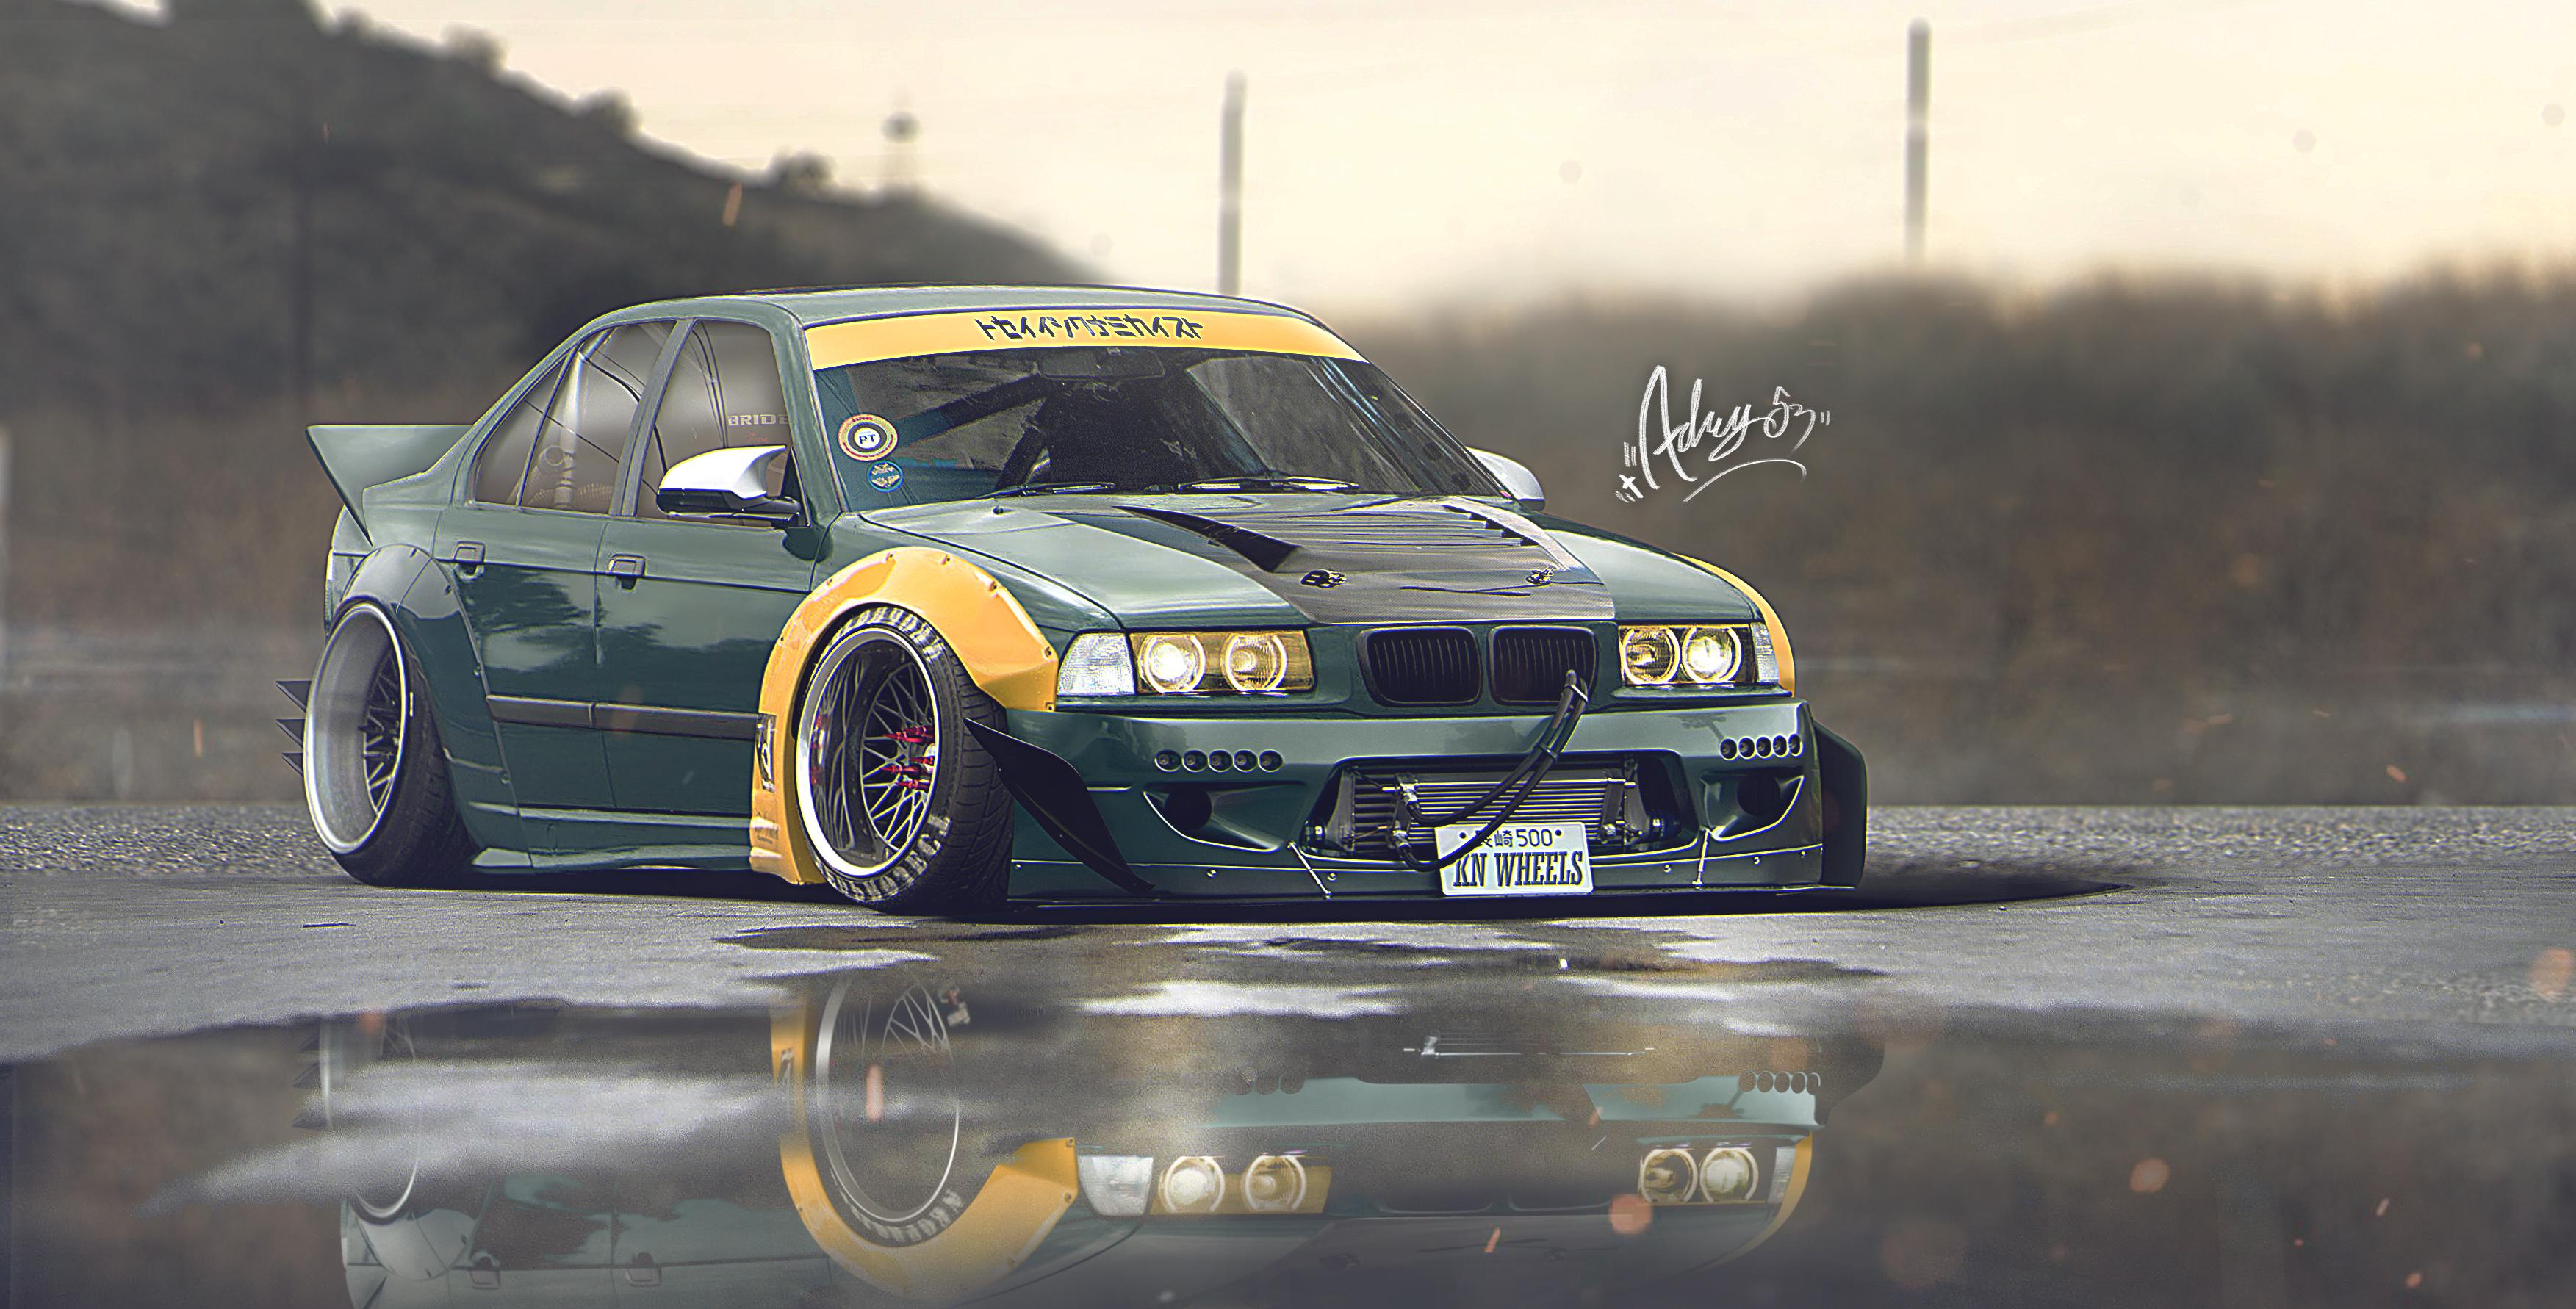 BMW 3 Series HD Wallpaper   Background Image   3506x1782 ...